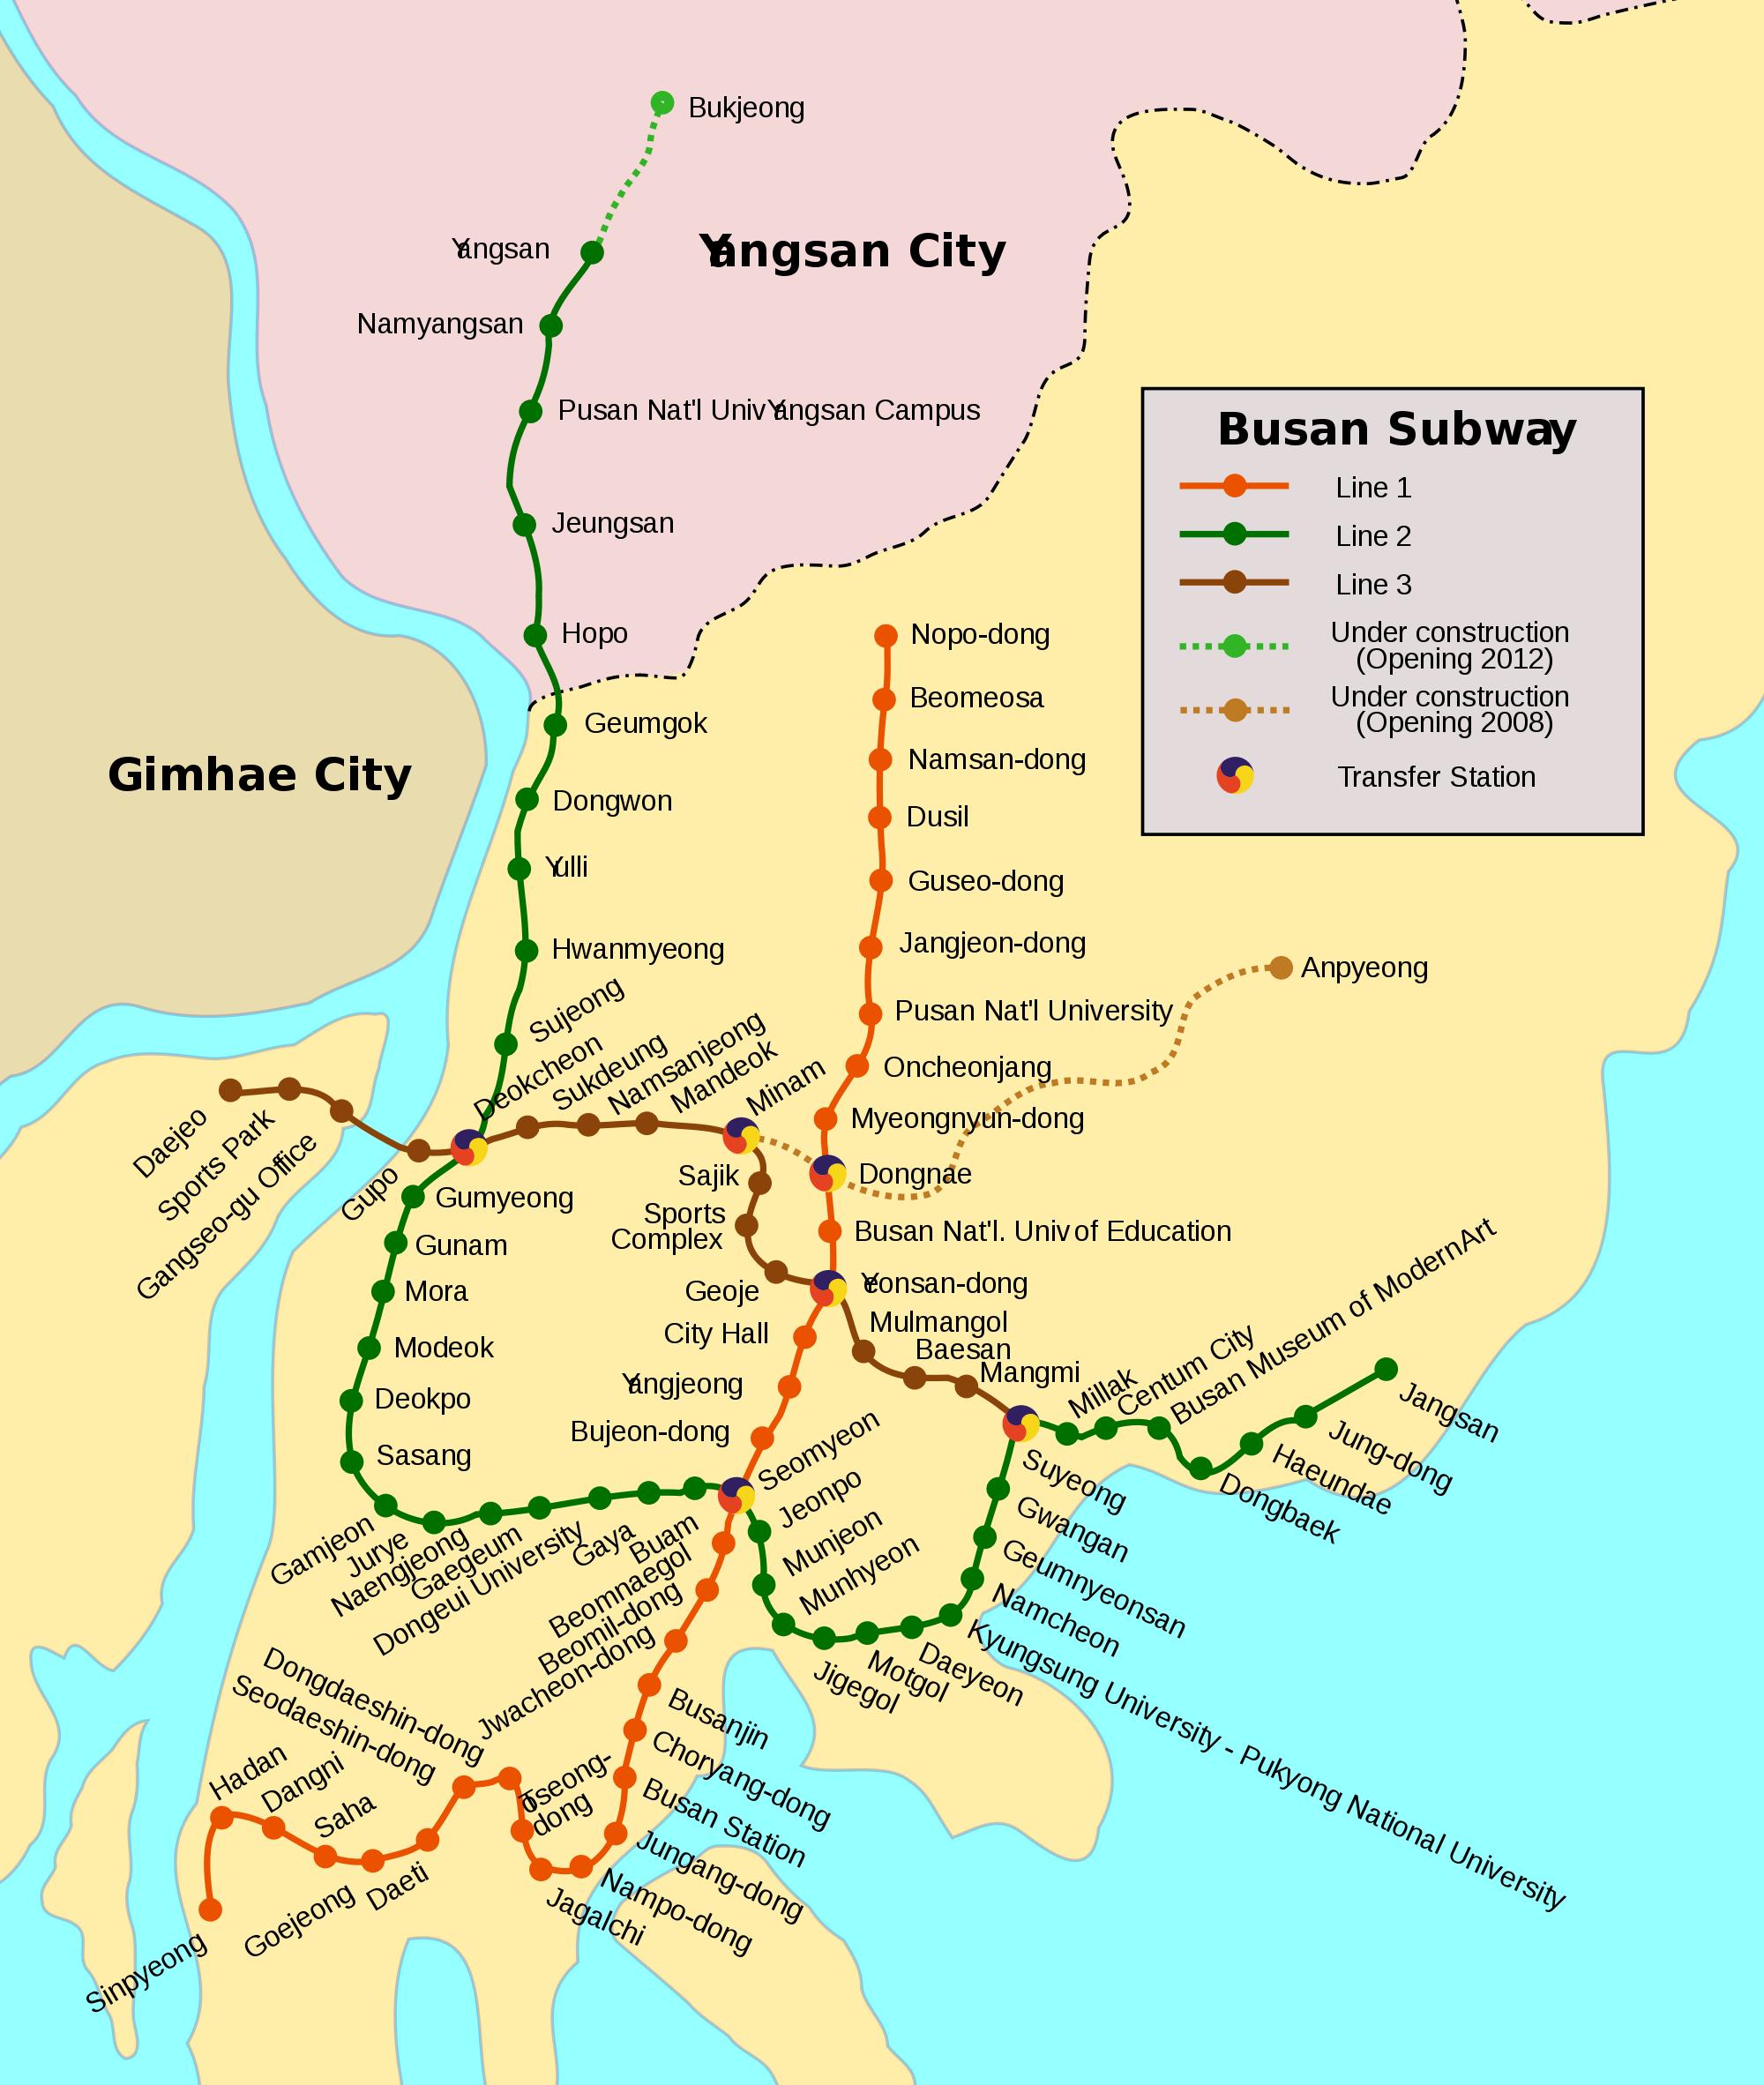 Korea Subway Map 2014.Subway Busan Metro Map South Korea